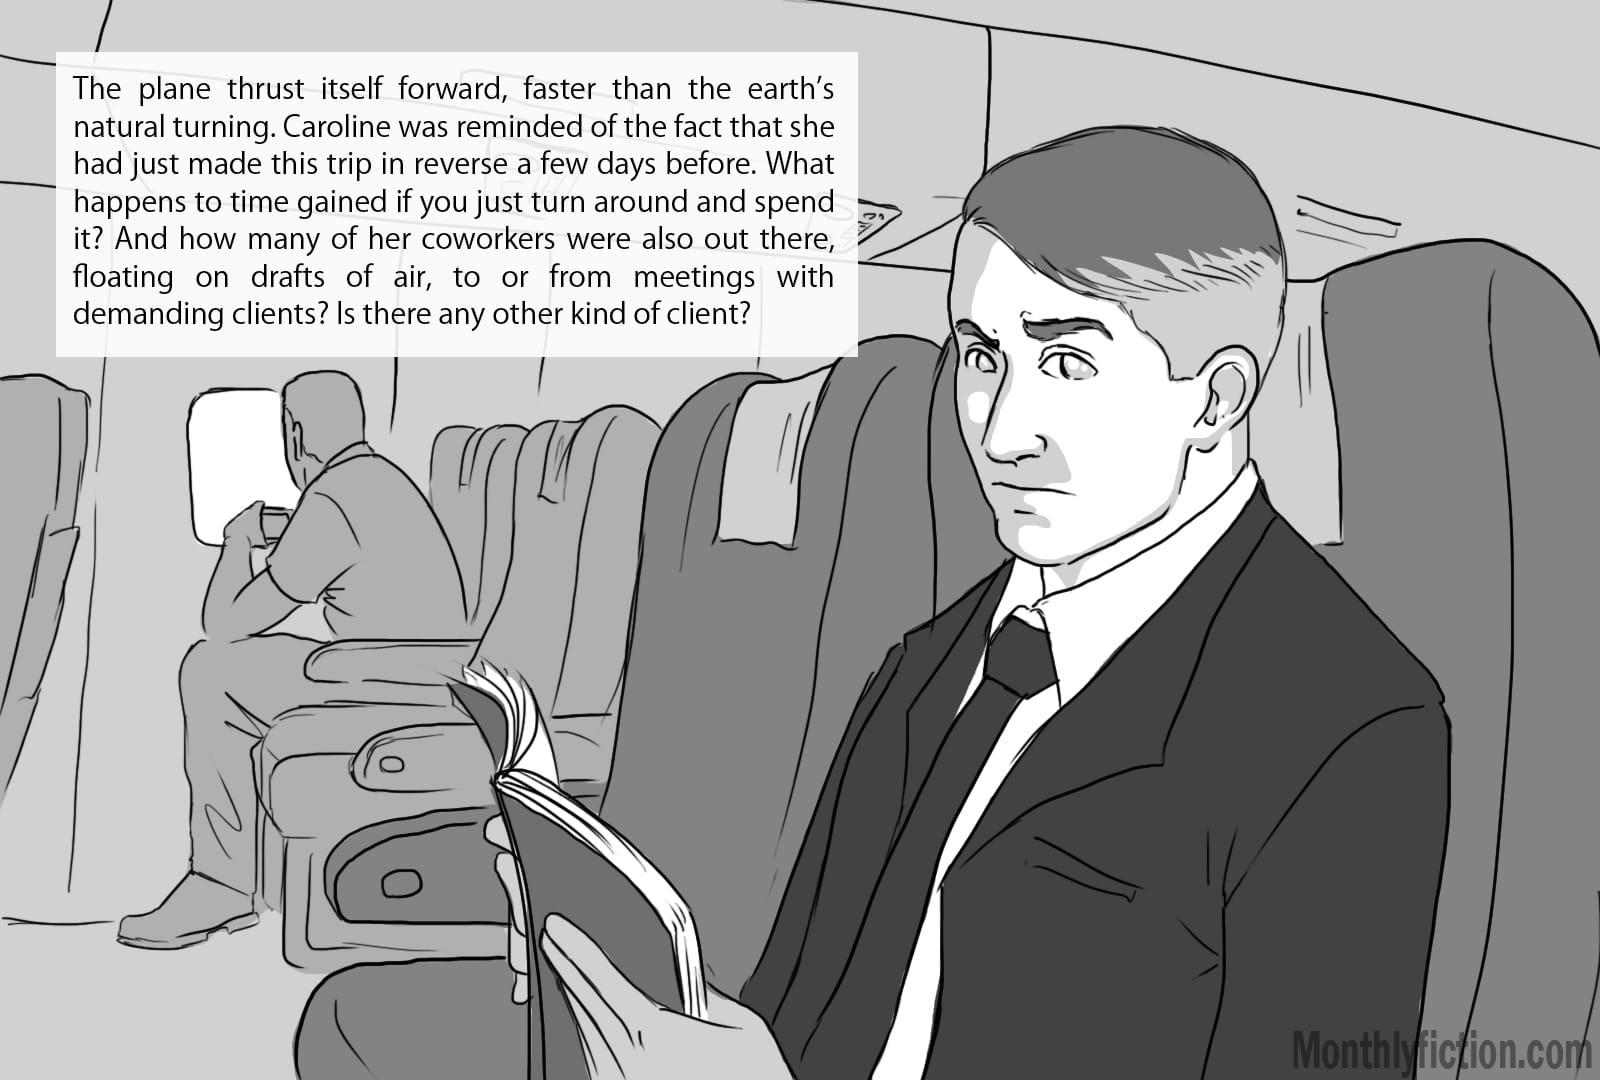 Monthly Fiction Takeoffs and landings illustration illustraded story deborah burke camilo sandoval page 8